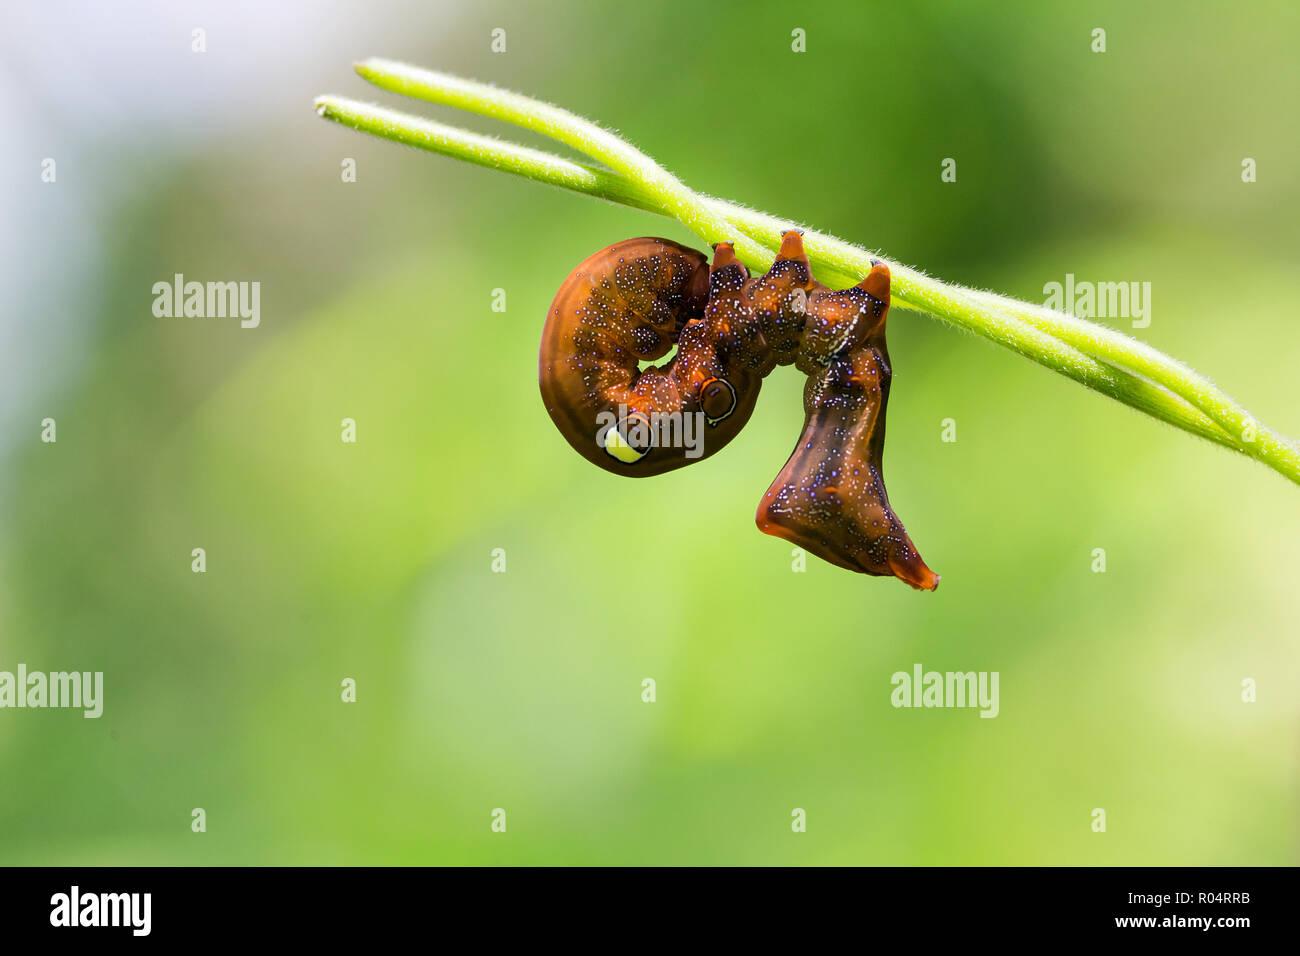 The strange cartepillar of Eudocima Salamina standing on vines - Stock Image